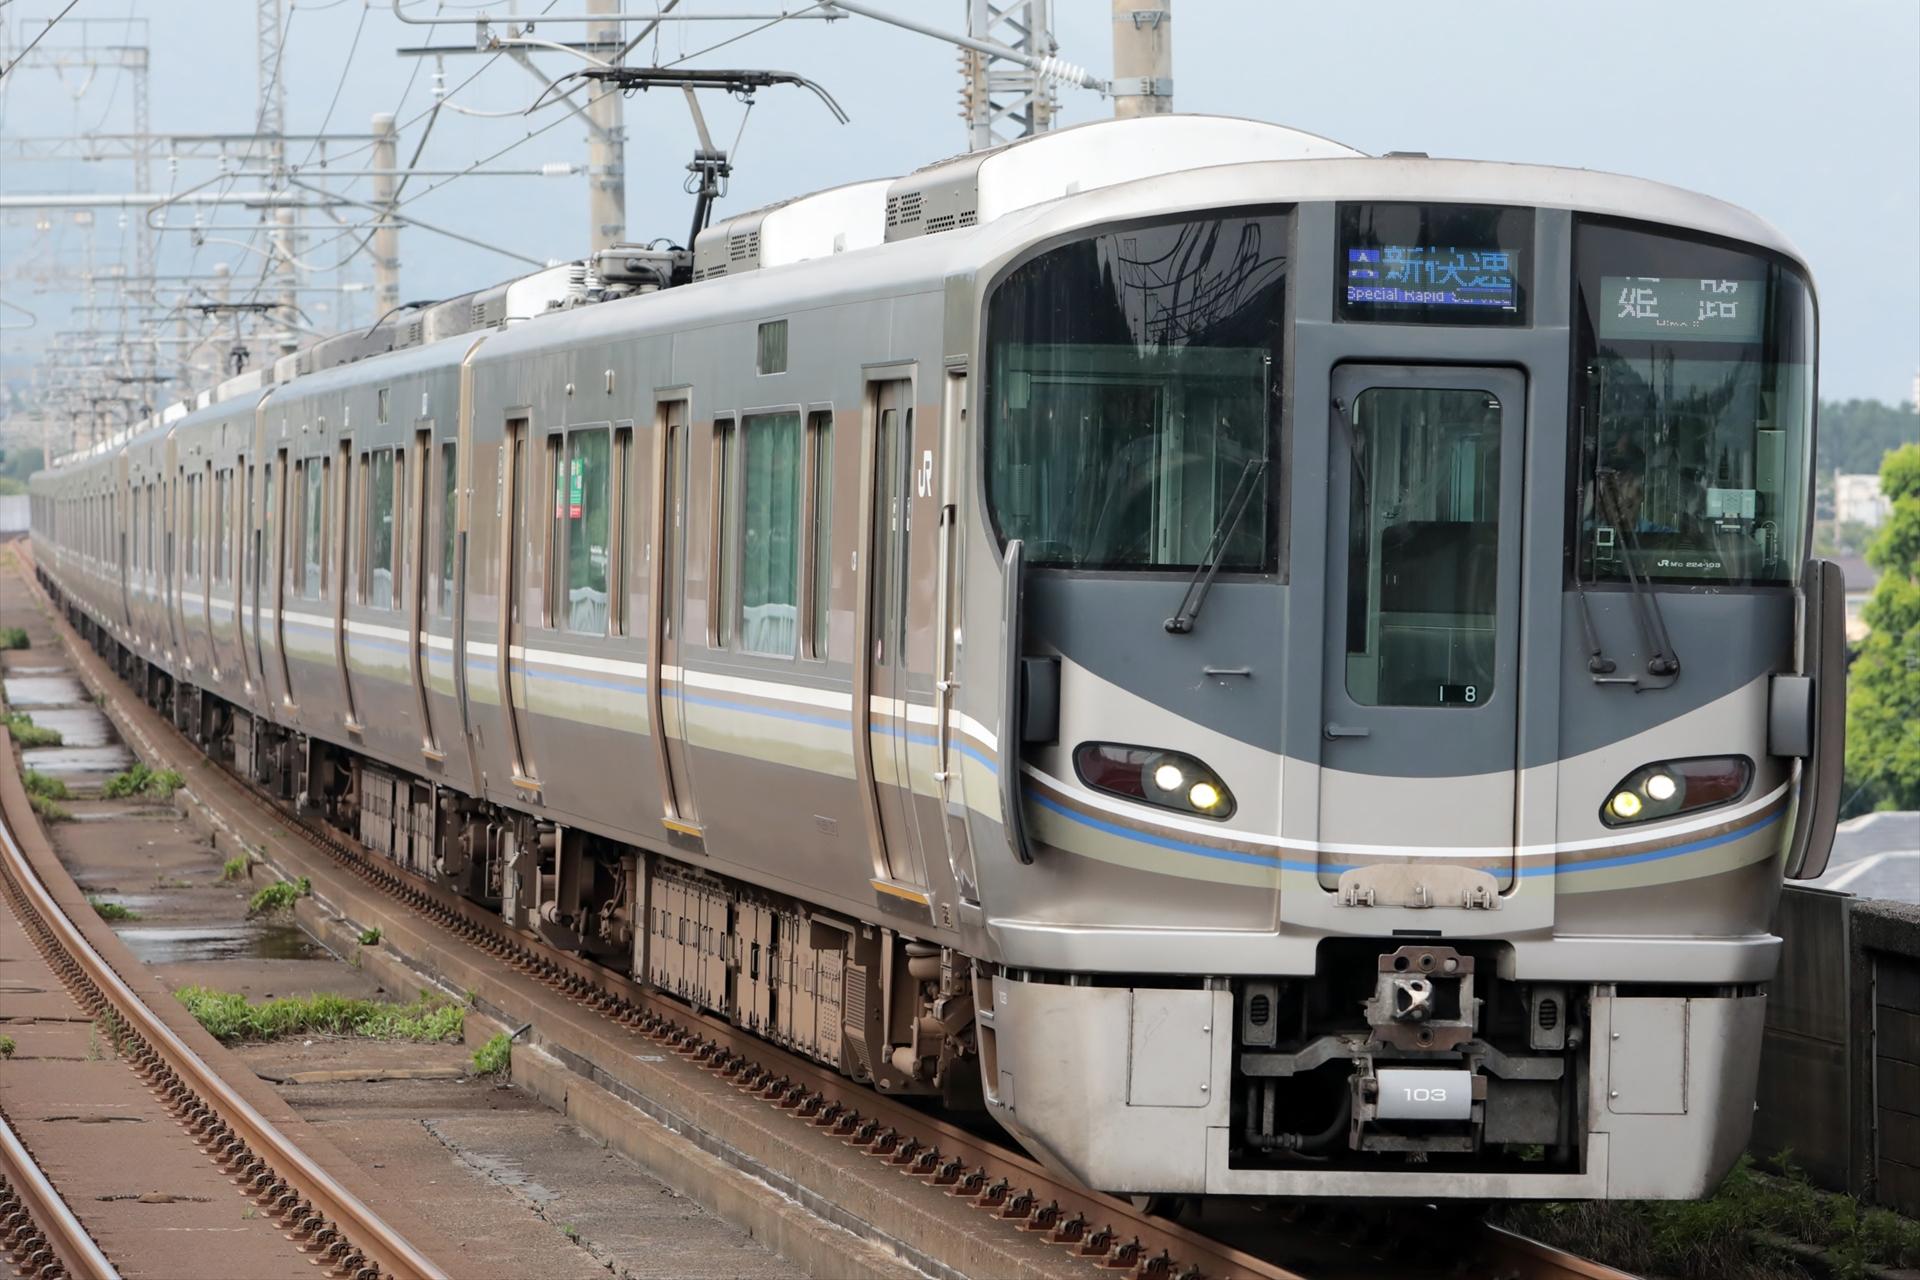 JR西日本、京都線・神戸線に「225系」投入。201系は引退へ - トラベル ...